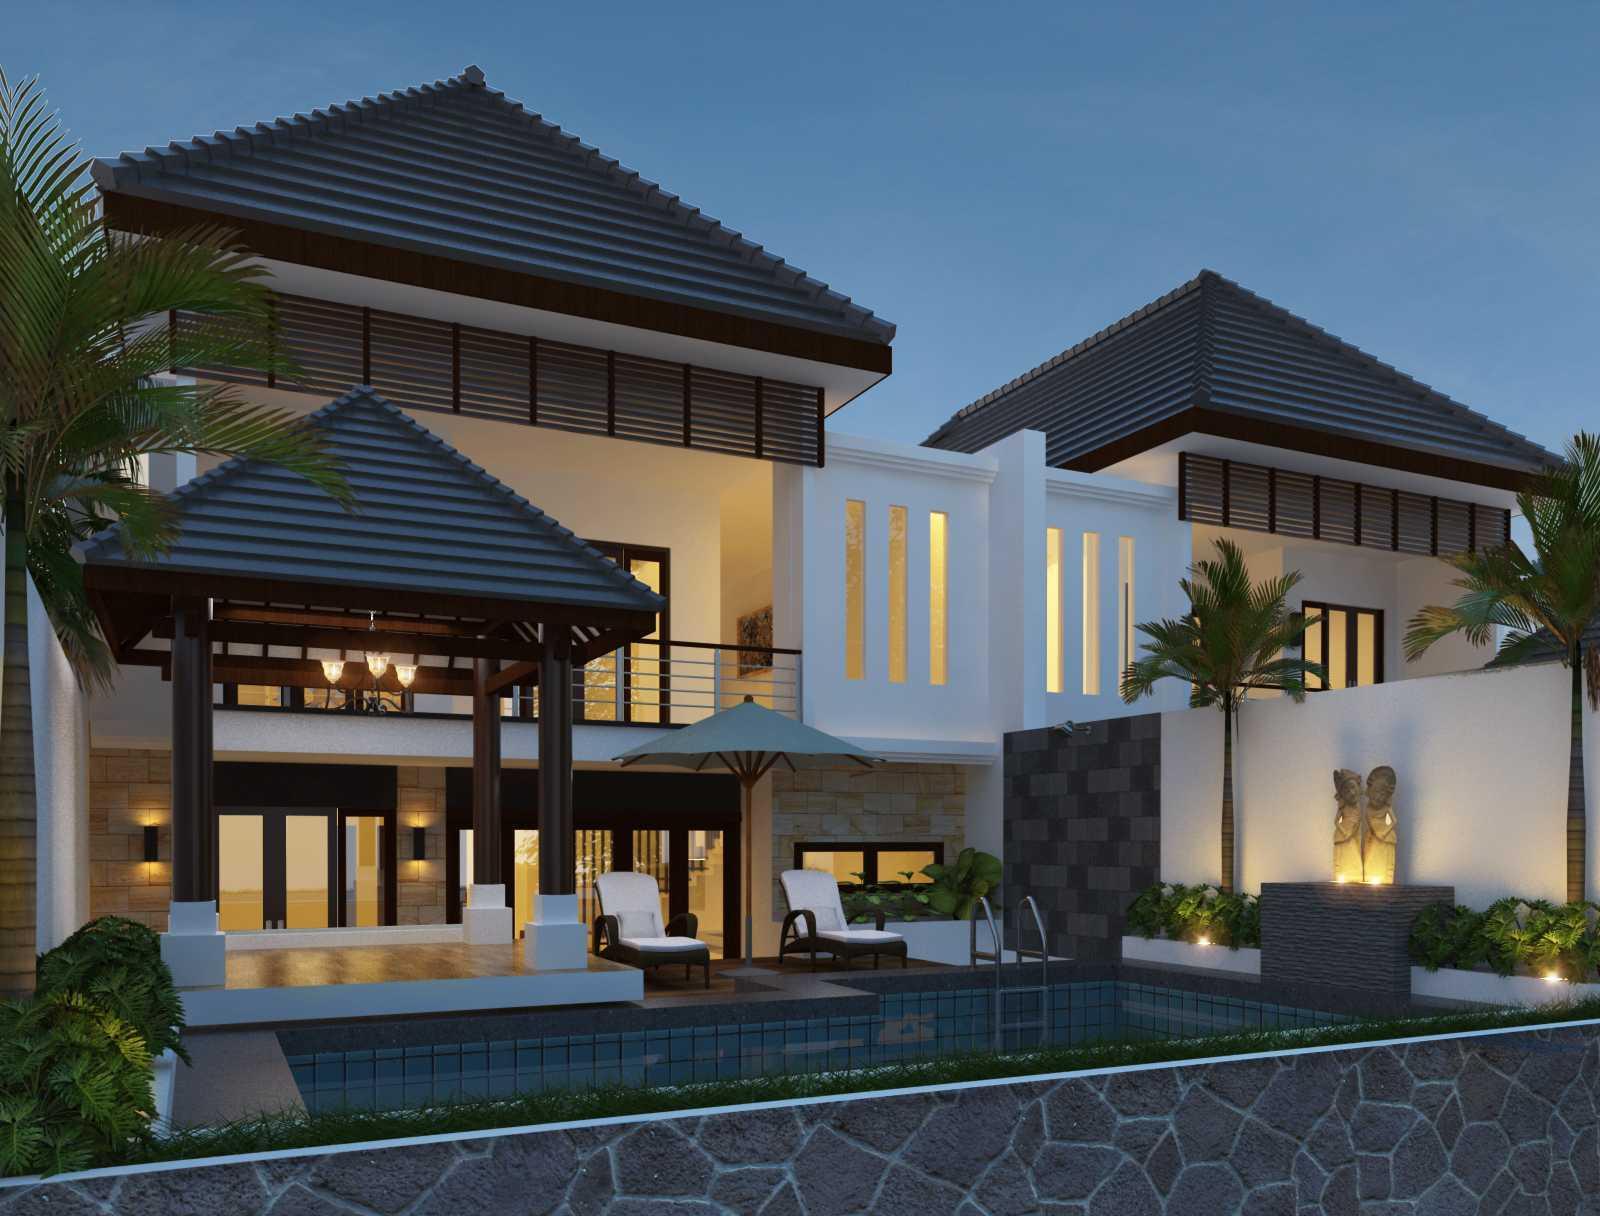 Arsatama Architect Langkung Villa`s - Bali Gianyar, Gianyar Sub-District, Gianyar, Bali, Indonesia Bali, Indonesia View-Poollangkung-Villas   23617